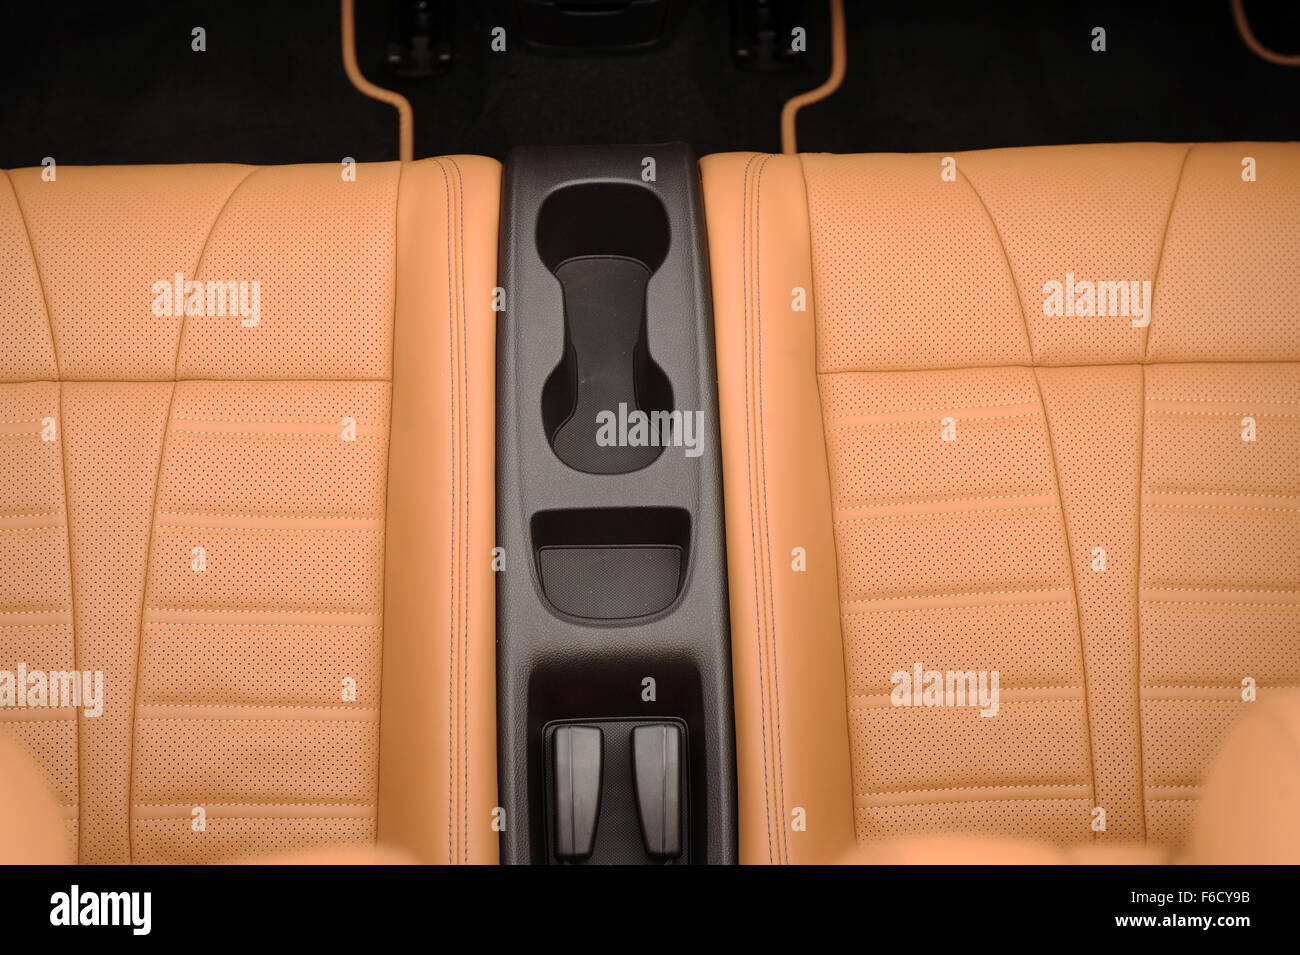 Vauxhall Cascada Elite 2.0CDTi 16v (165PS) - Stock Image